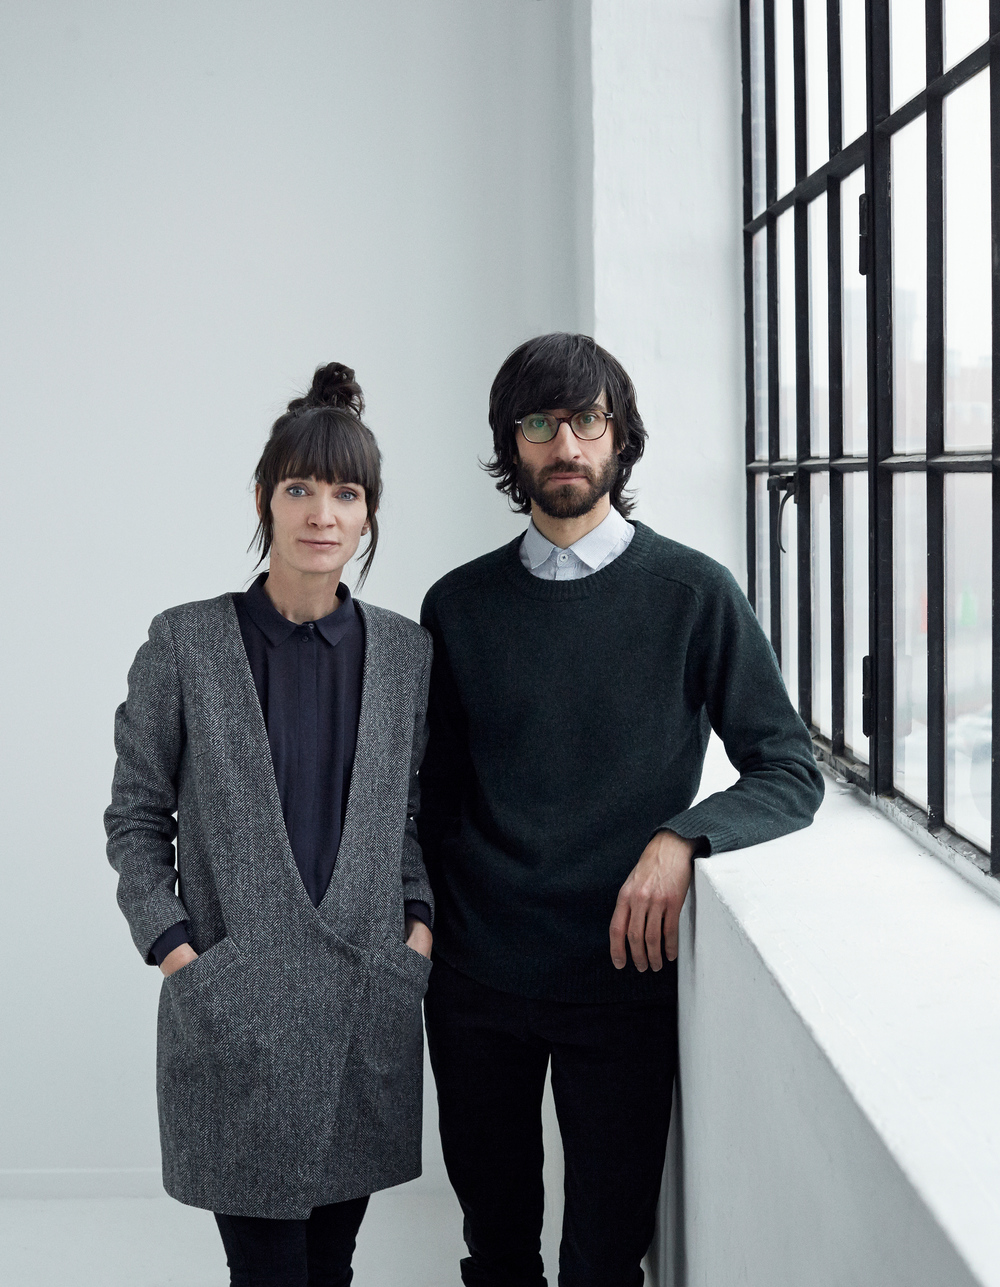 Gam Fratesi / Mindcraft / London Design Journal